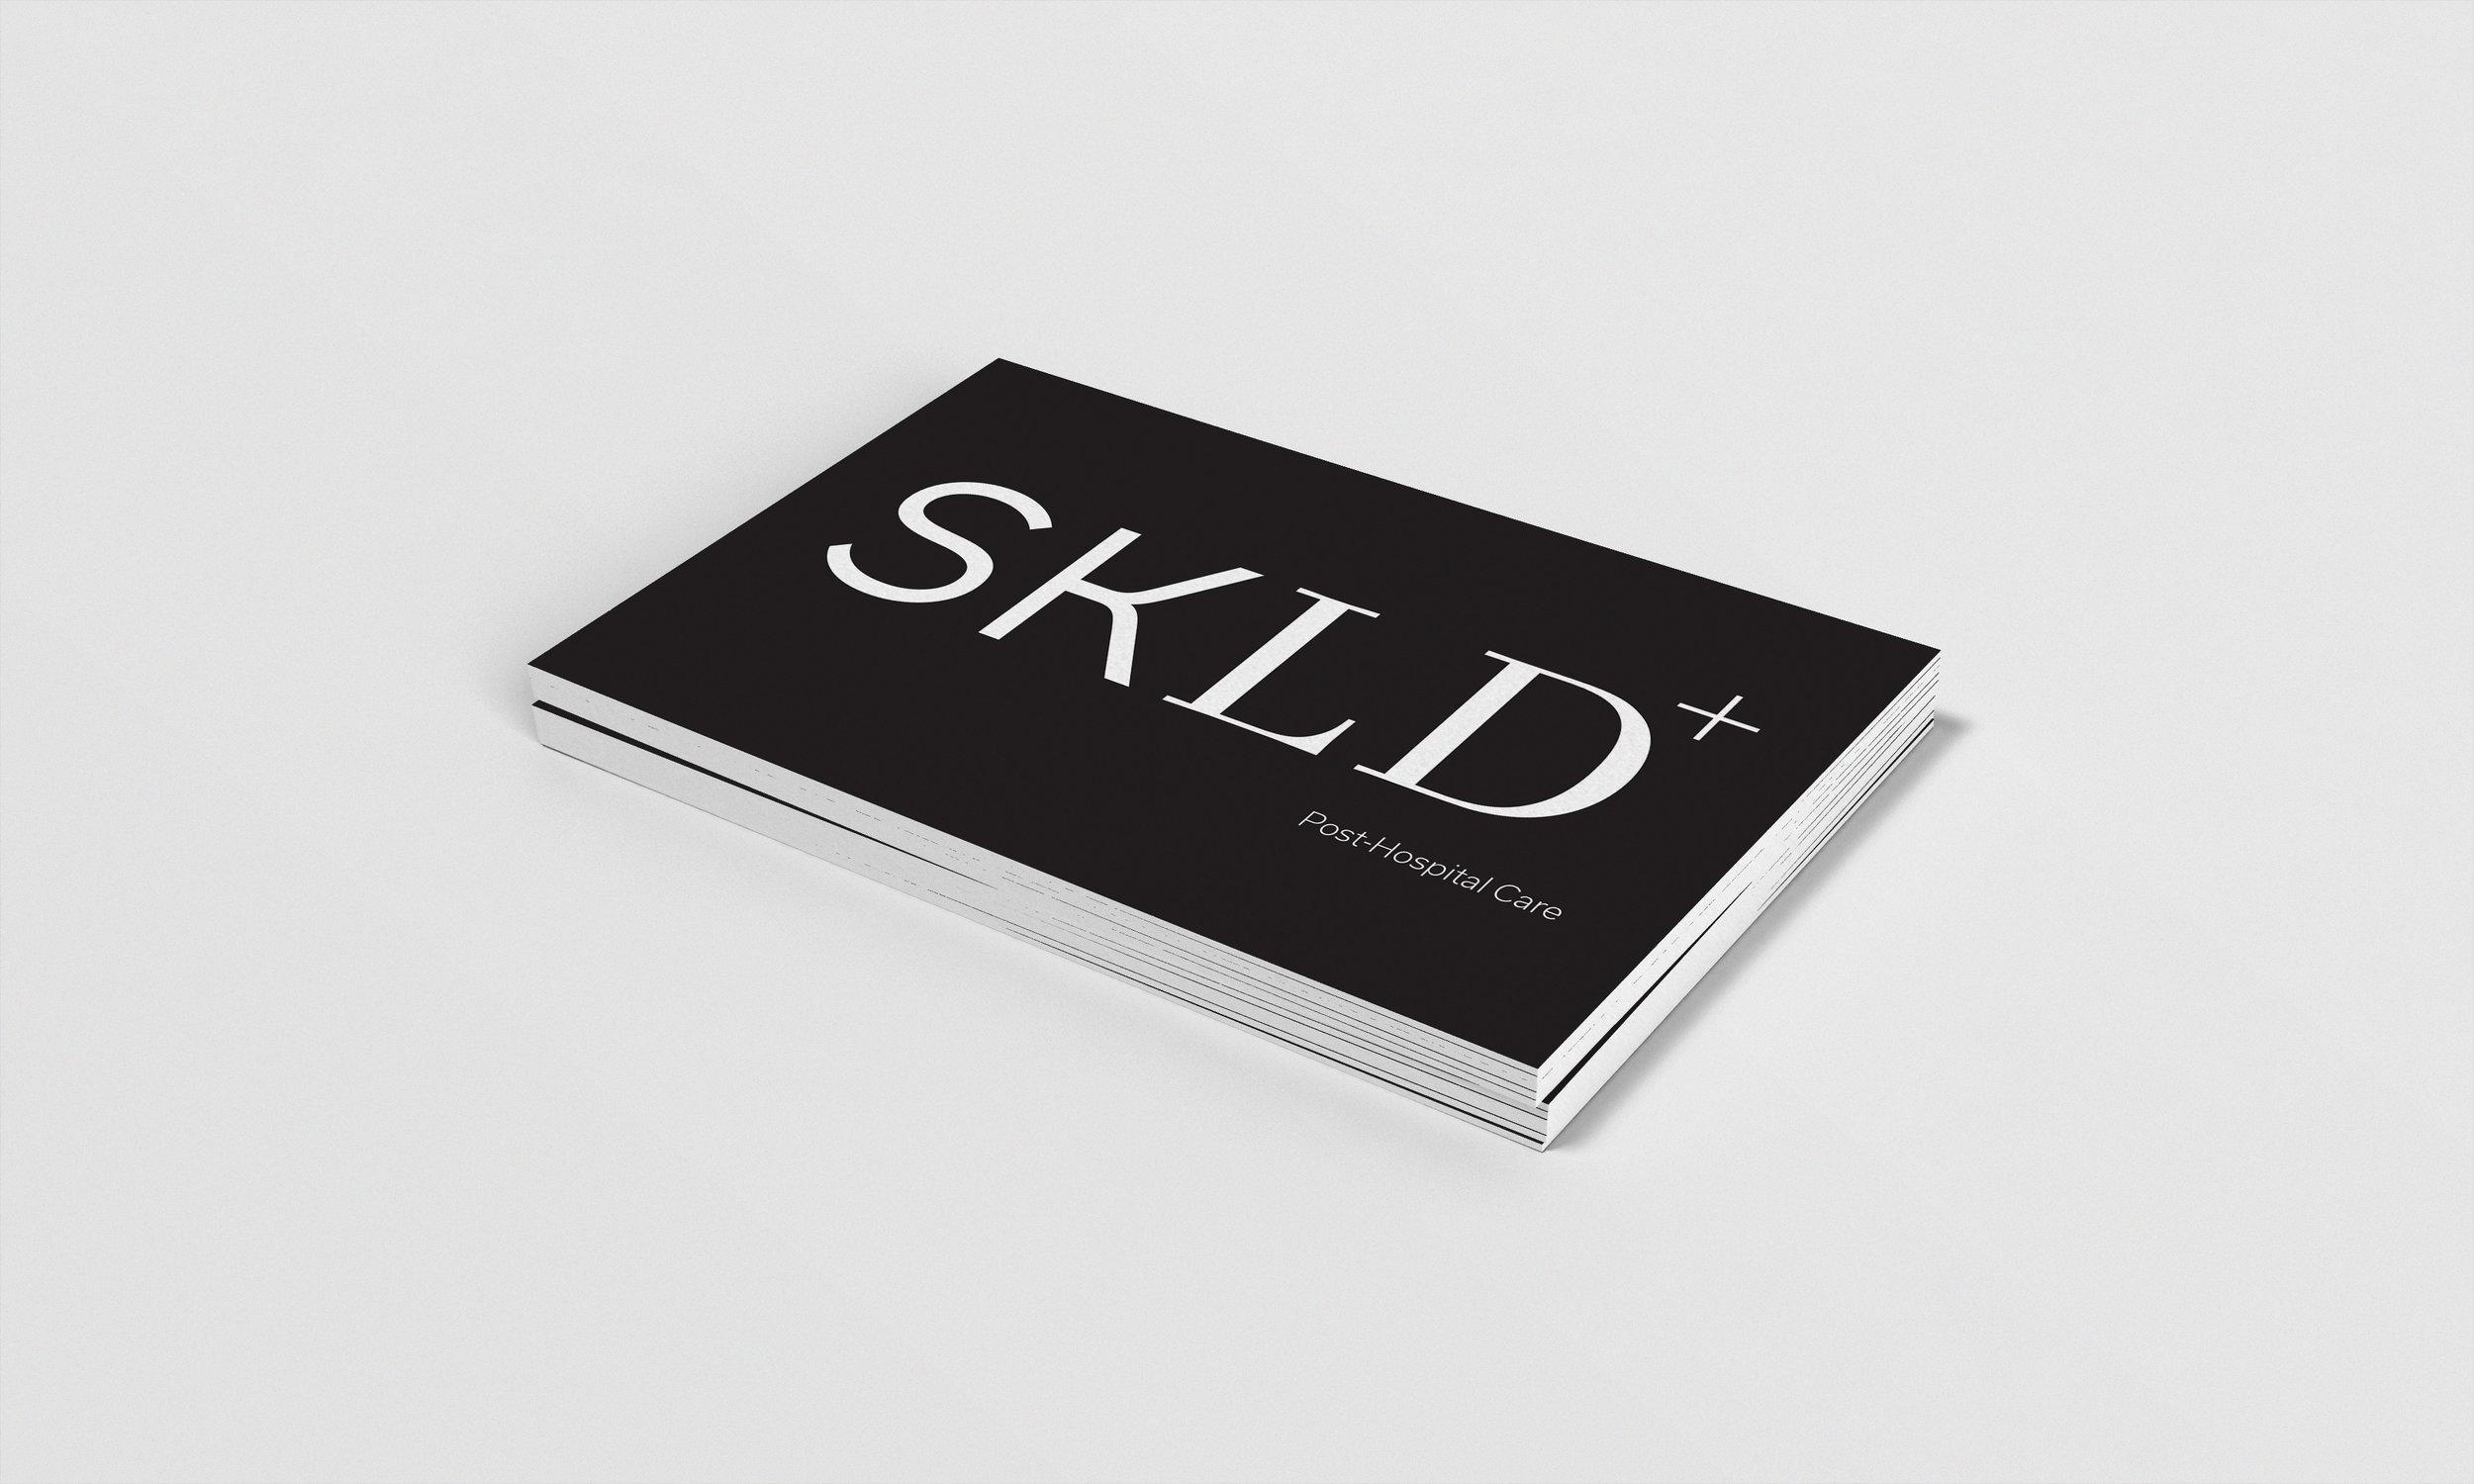 3D_skld+_black-card_2_3500w.jpg